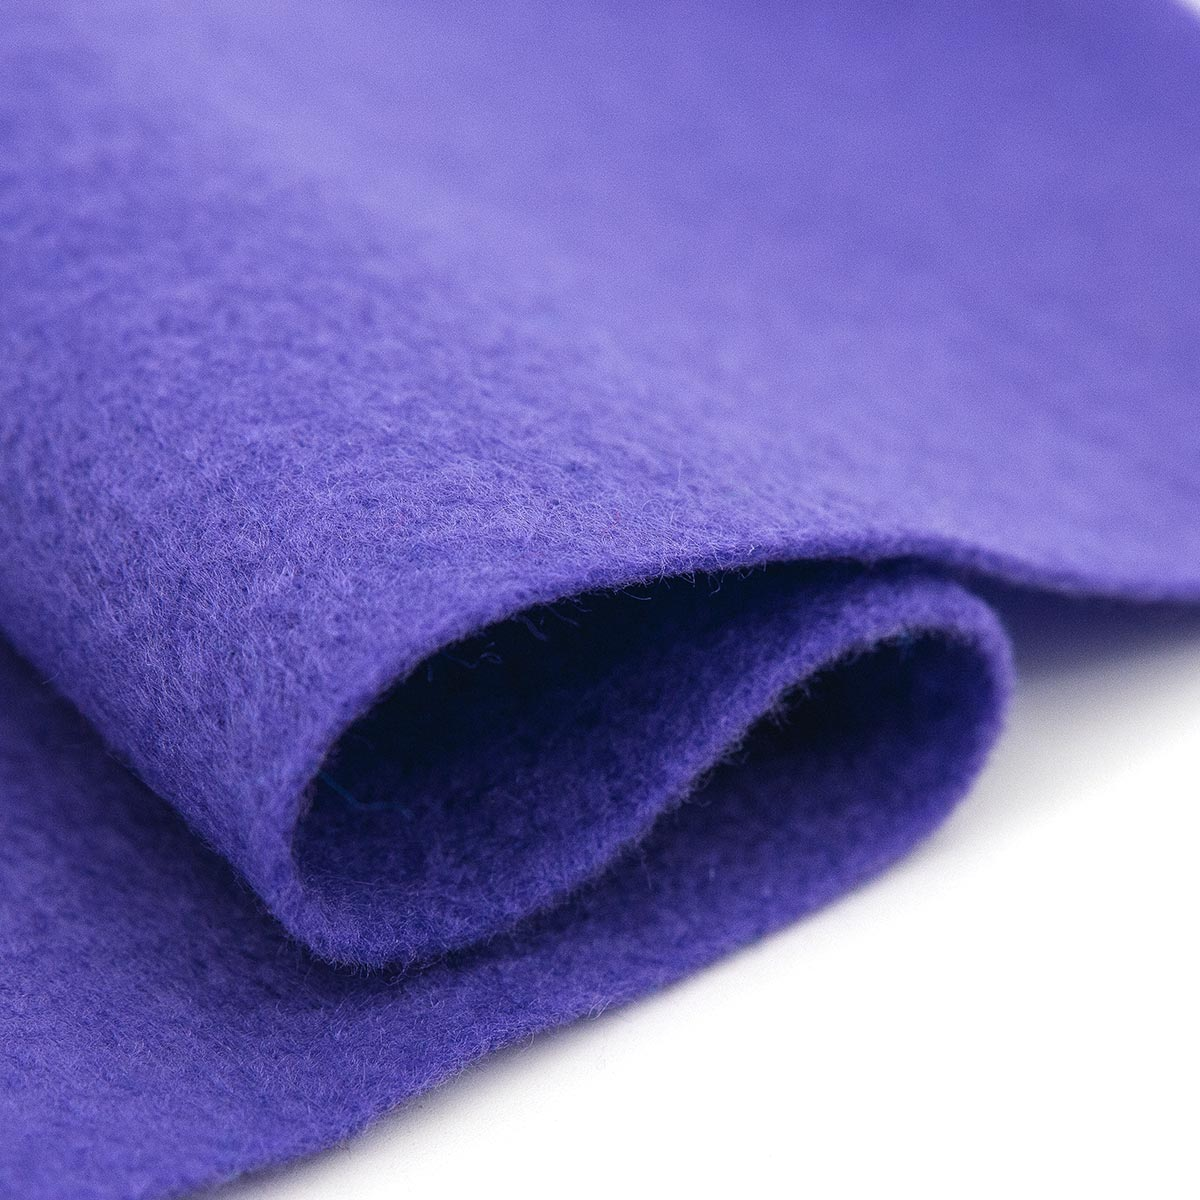 61212647 Фетр для творчества, фиолетовый, 2мм, 20x30см, уп./1шт. Glorex